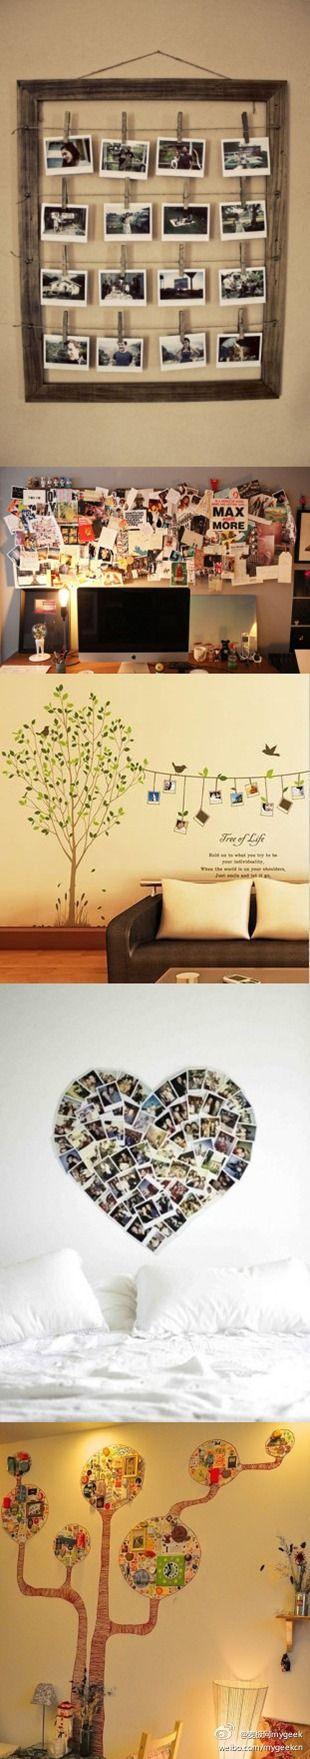 Geek Living Daily 120324   Geeky Home Stuff   Geeky Gift Idea / Geek Living Blog